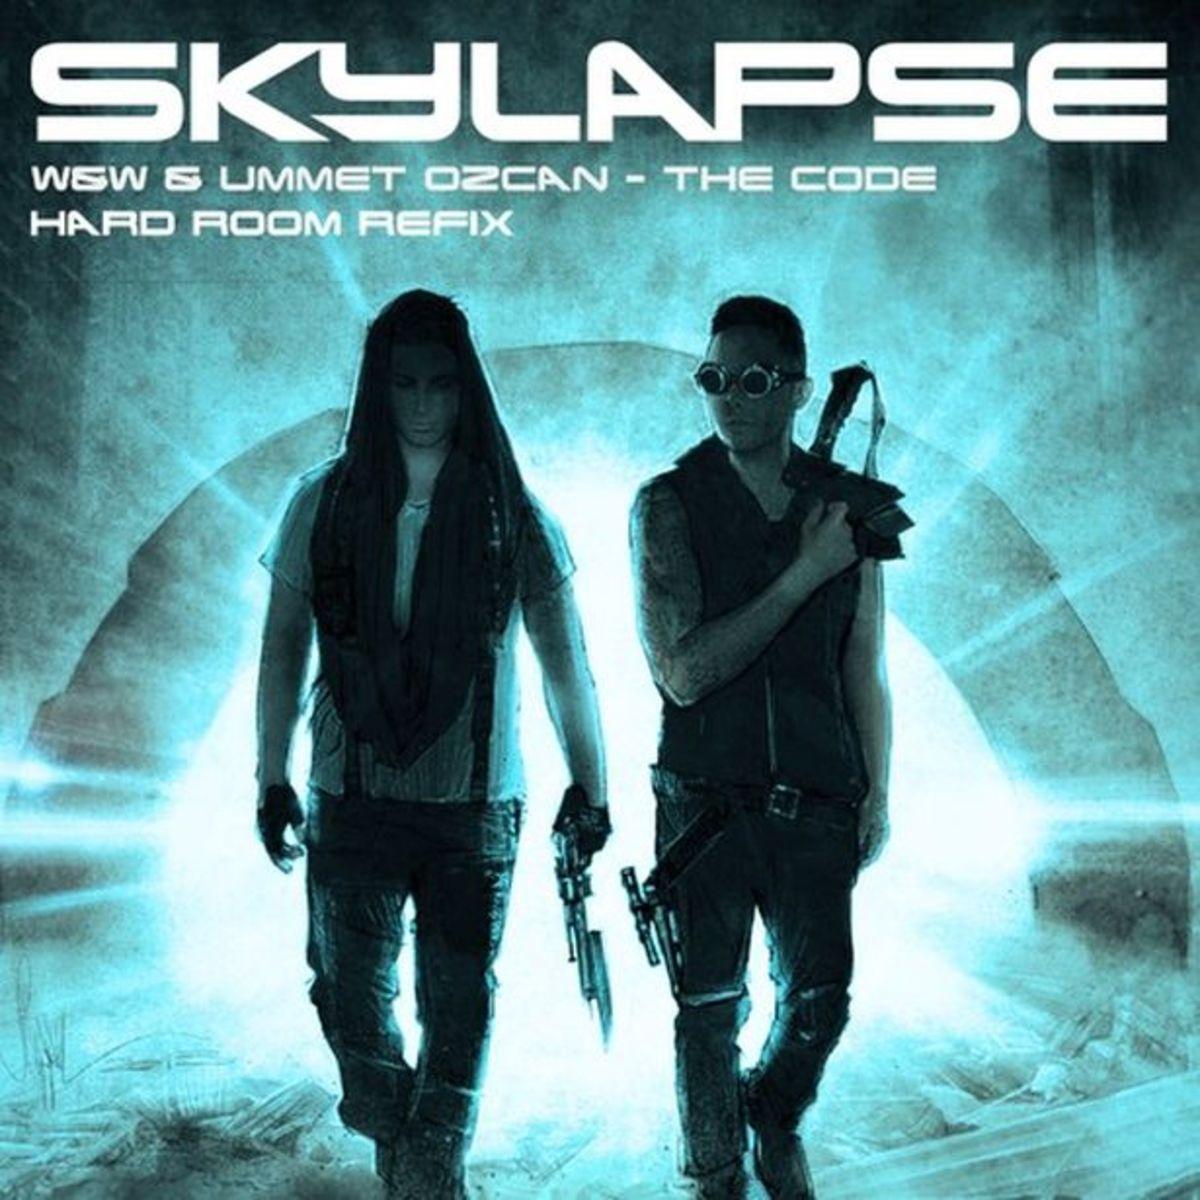 "EDM Download: W&W & Ummet Ozcan - ""The Code"" Skylapse Hardroom Refix; File Under Hard Style"